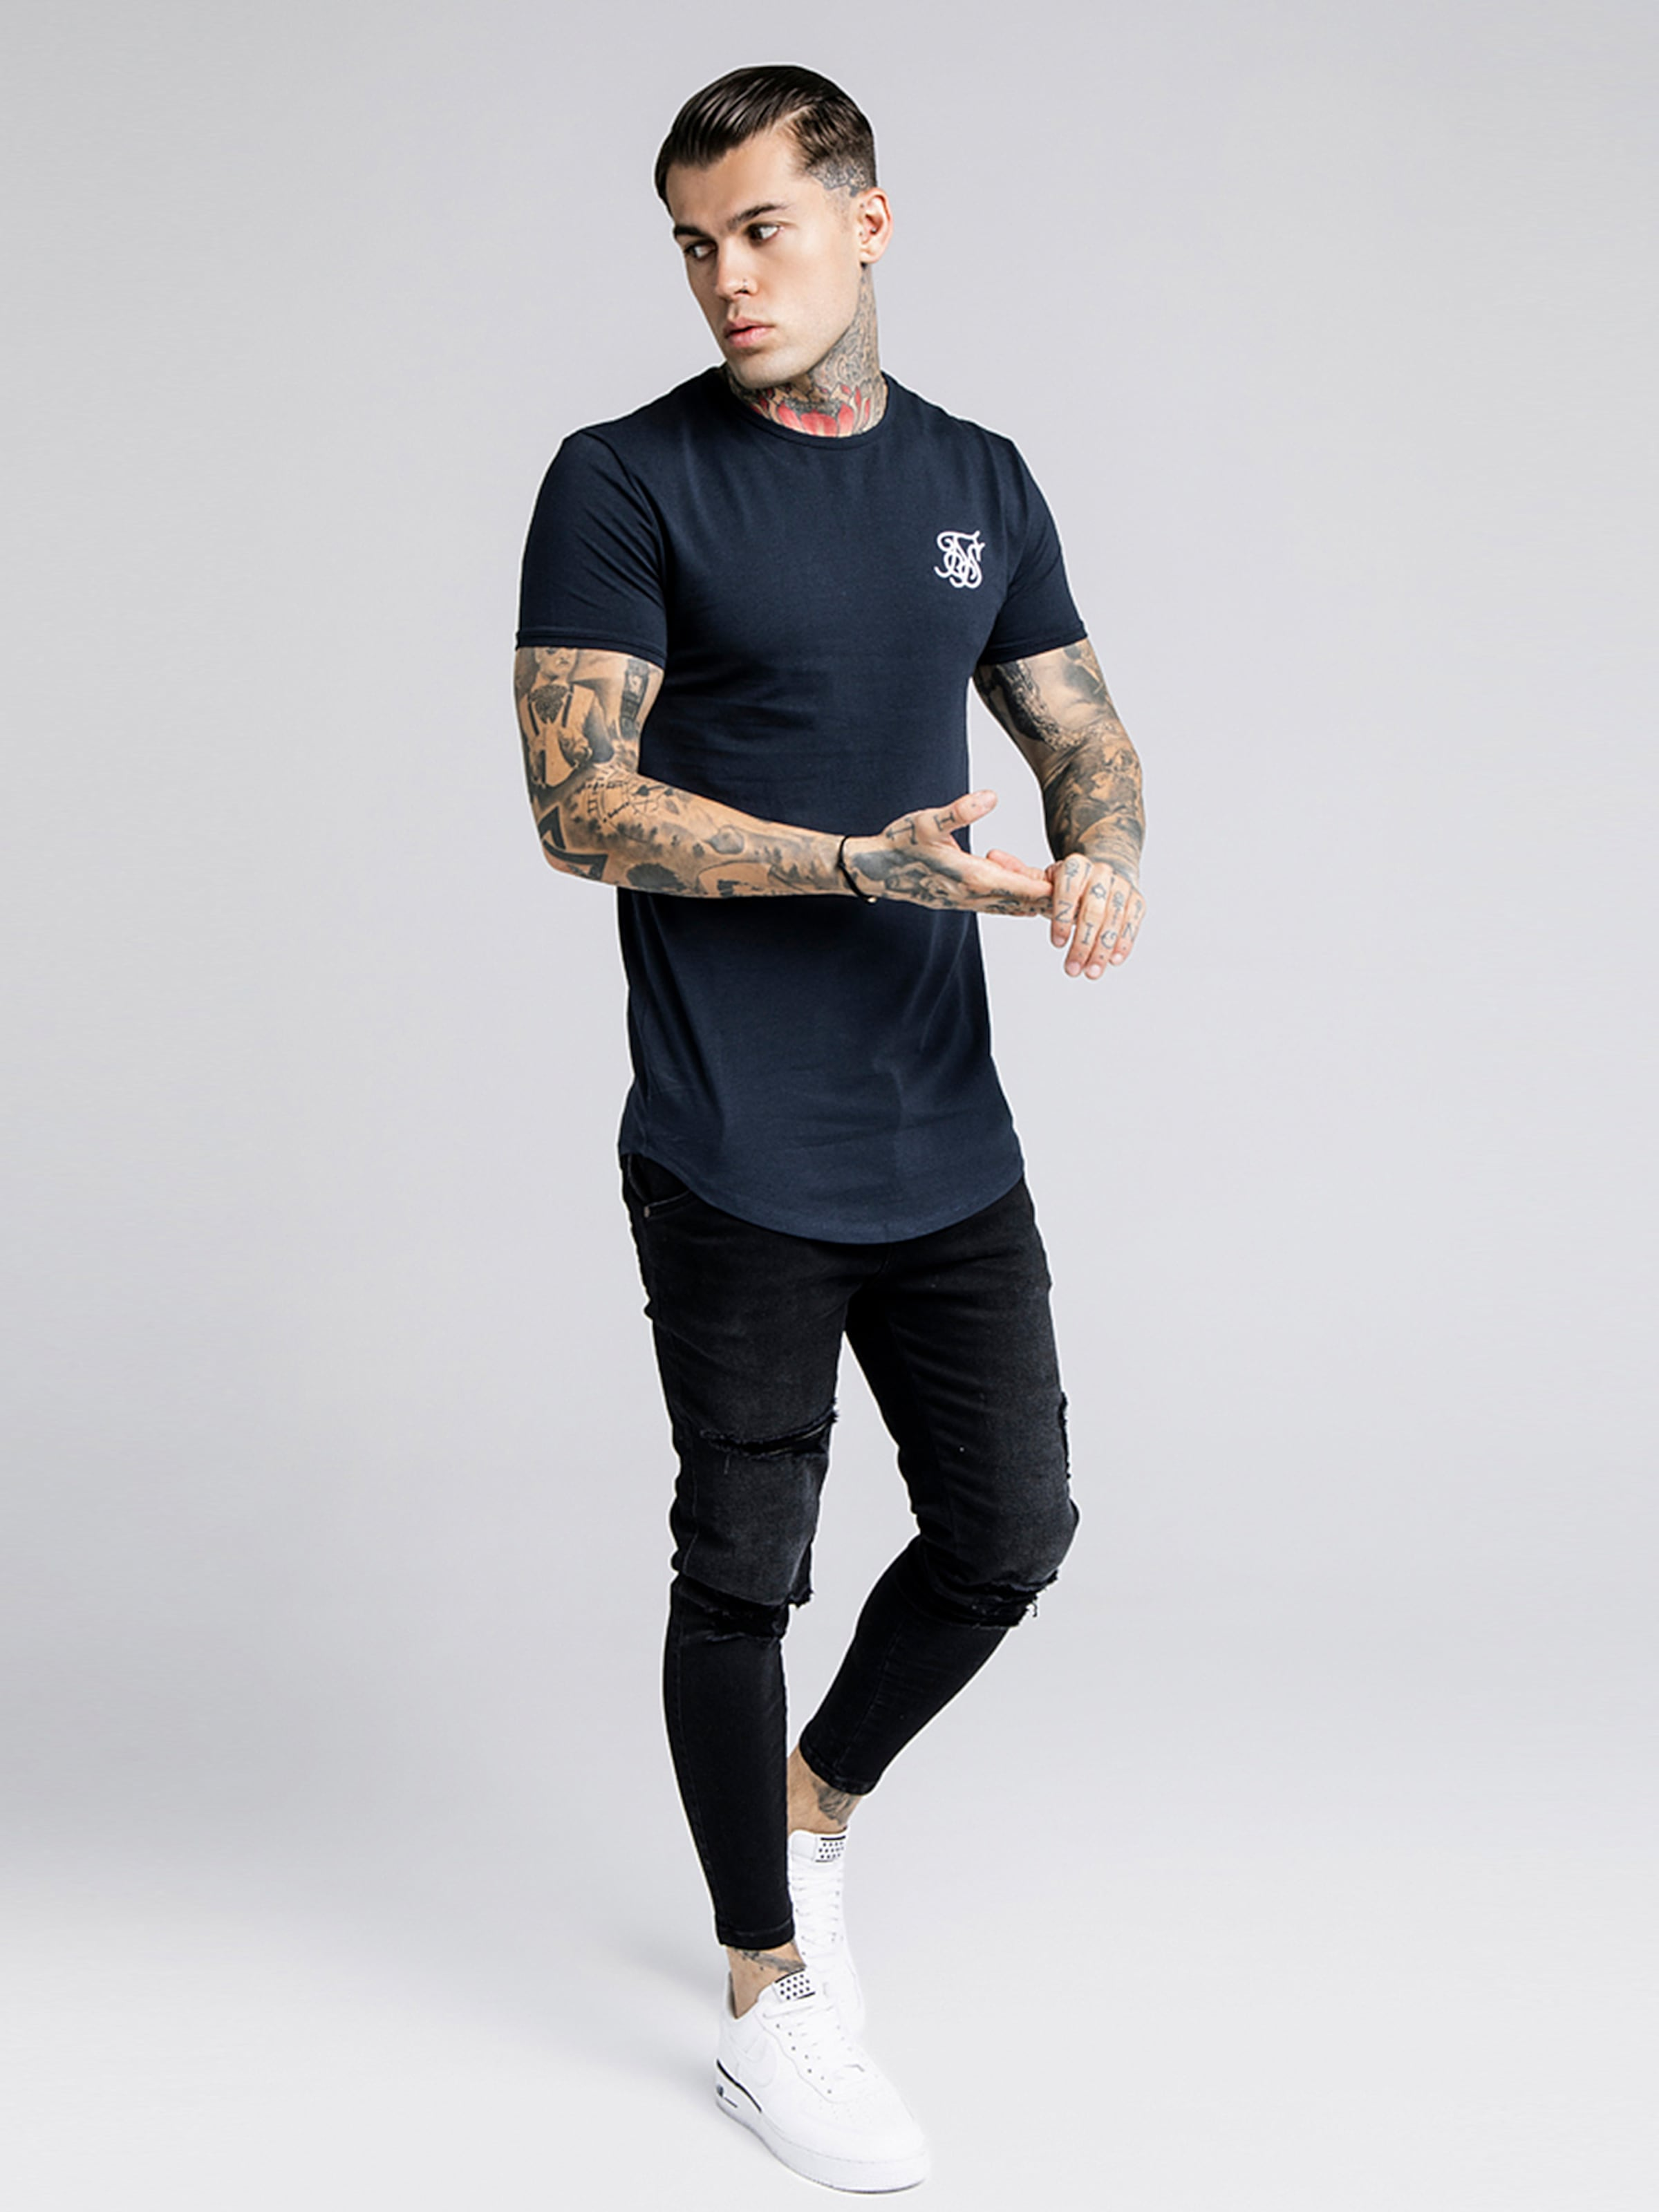 Bleu Marine Siksilk T shirt En IY7gb6vfy